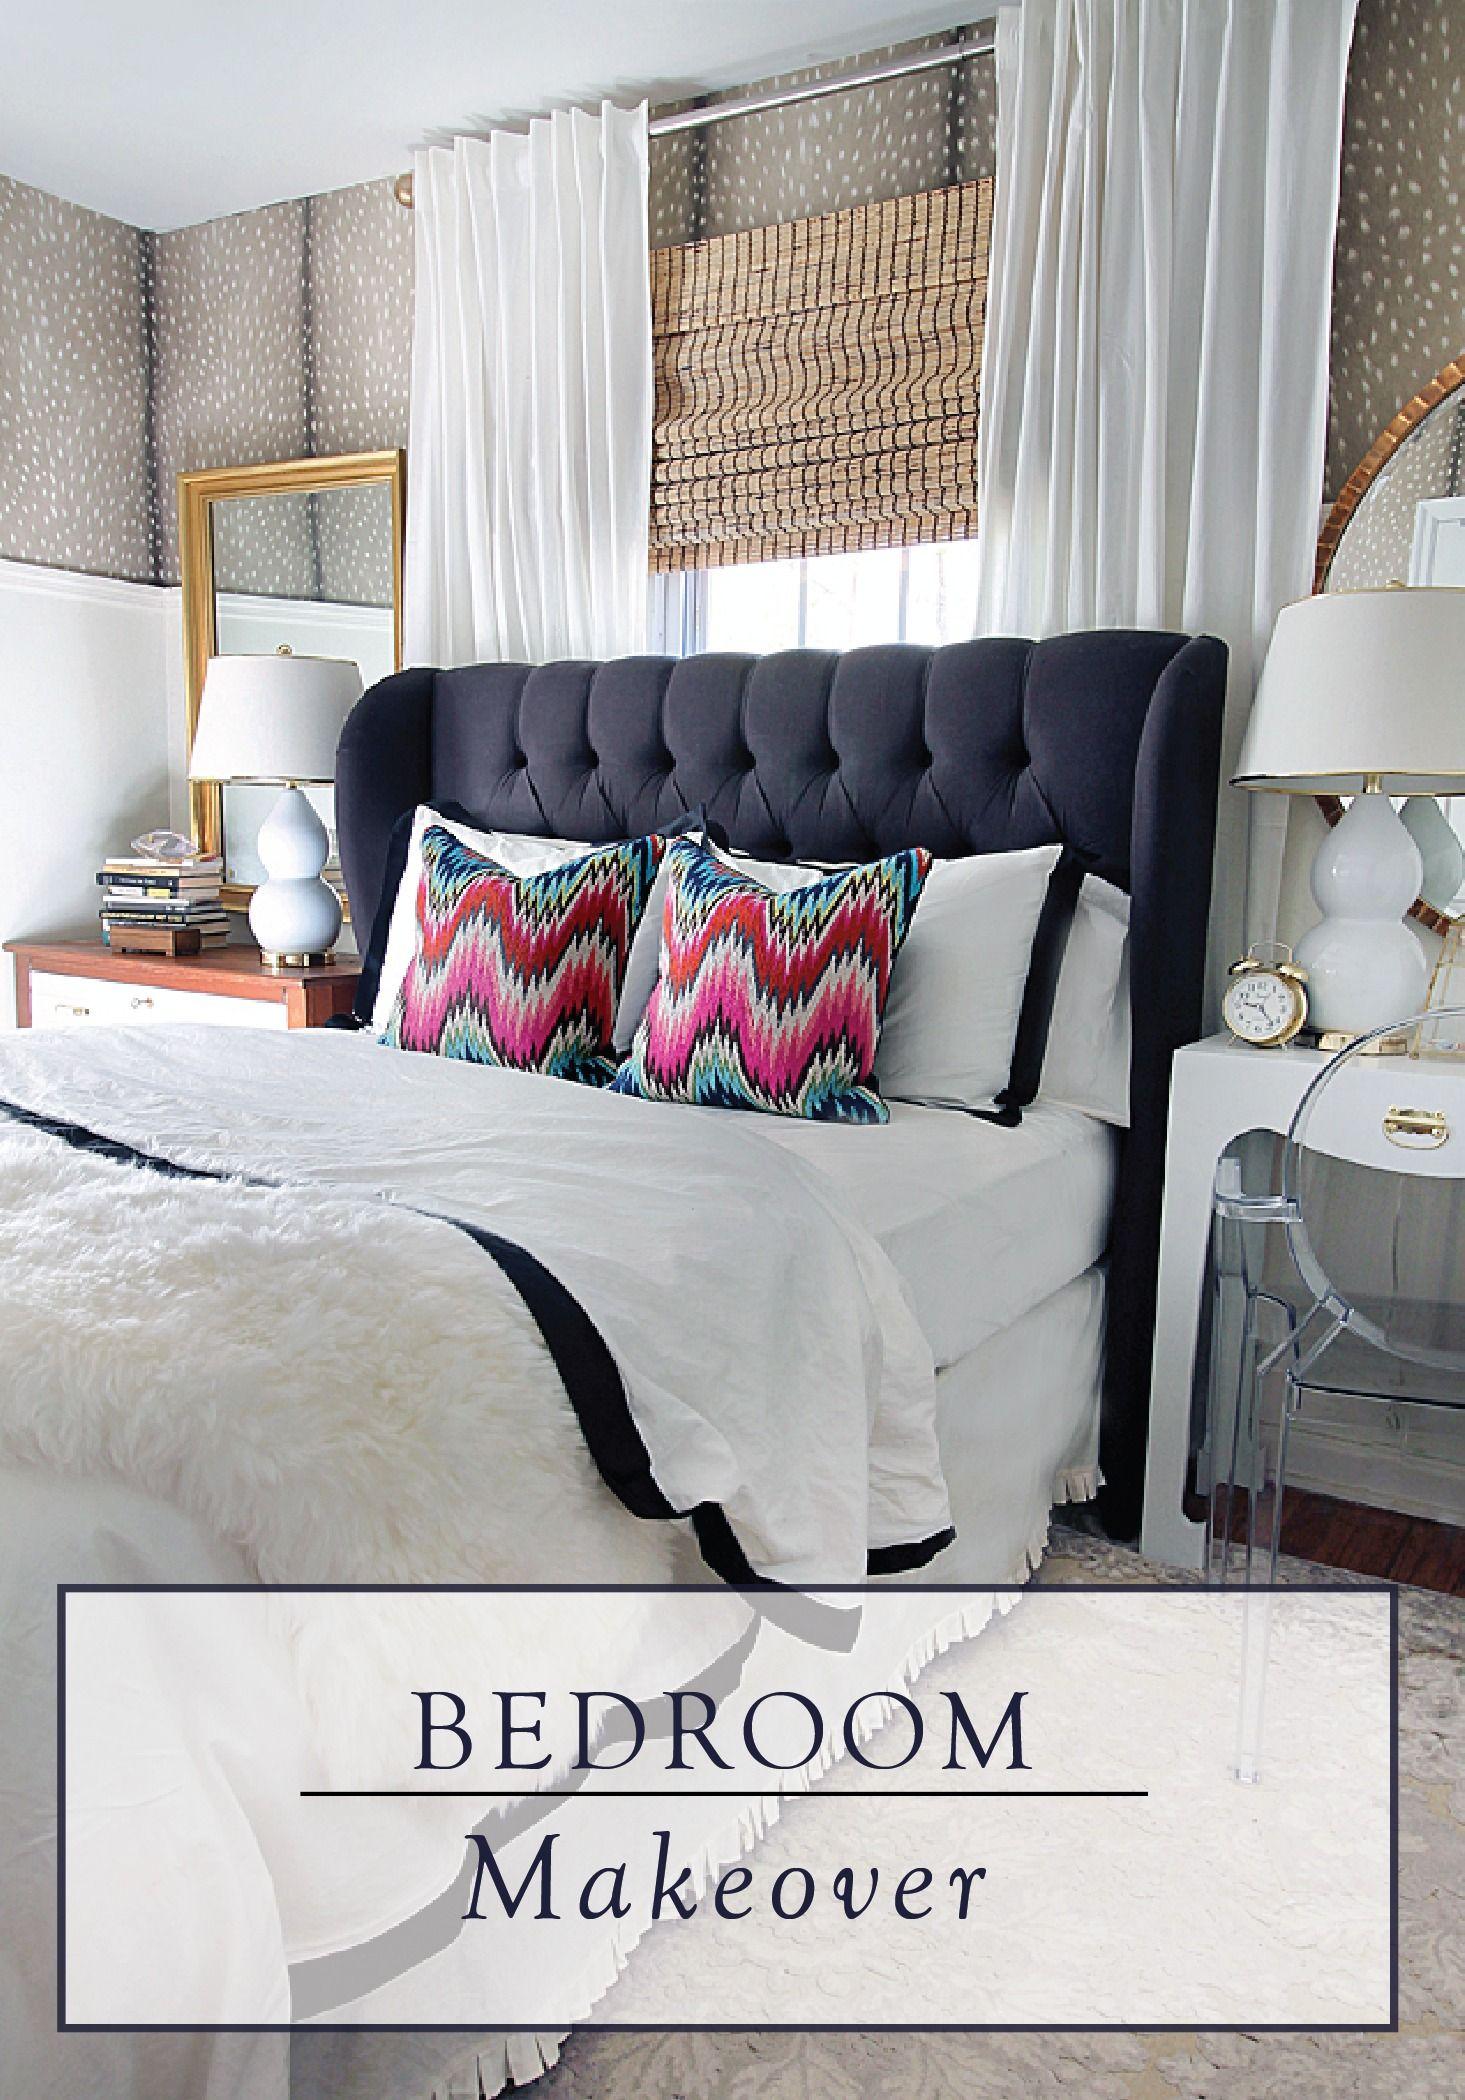 Diamond Tufted Wingback Headboard And Upholstered Bed Frame Etsy Black Upholstered Bed Black Headboard Bedroom Upholstered Bed Frame